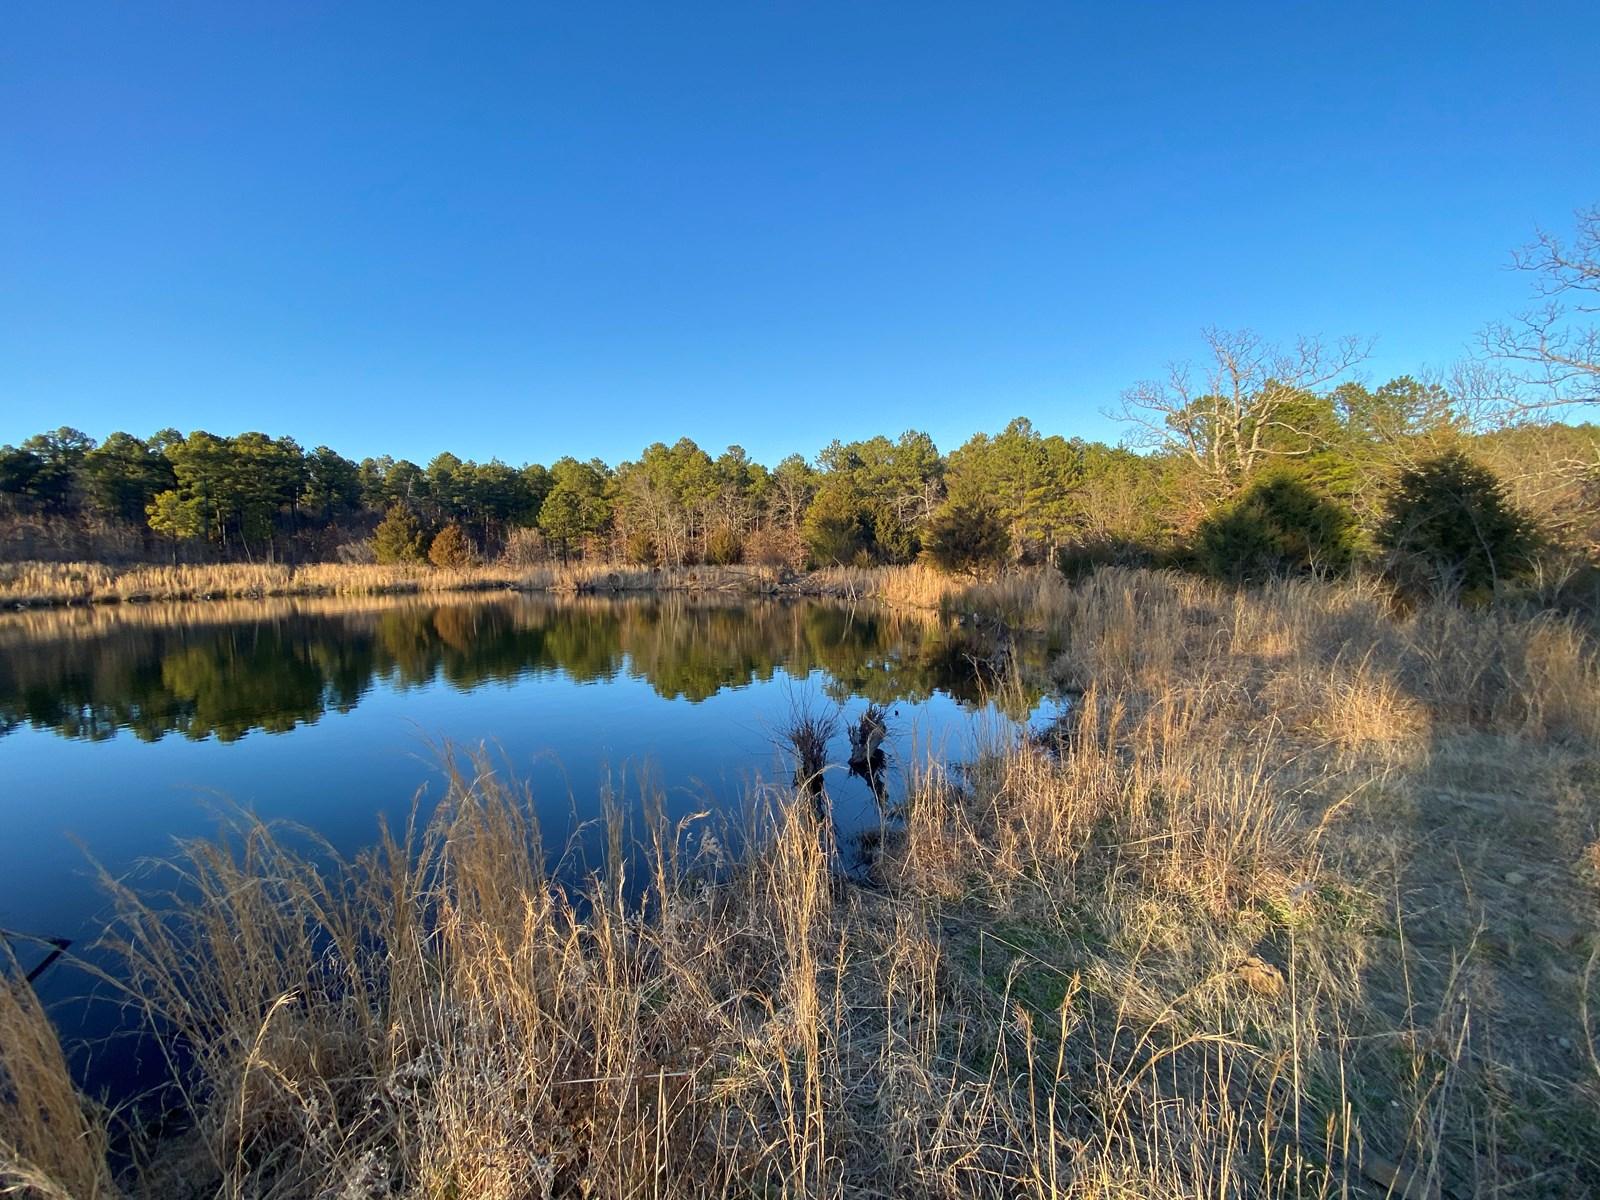 Hunting Land for Sale-SE Oklahoma Land for sale Wilburton,OK